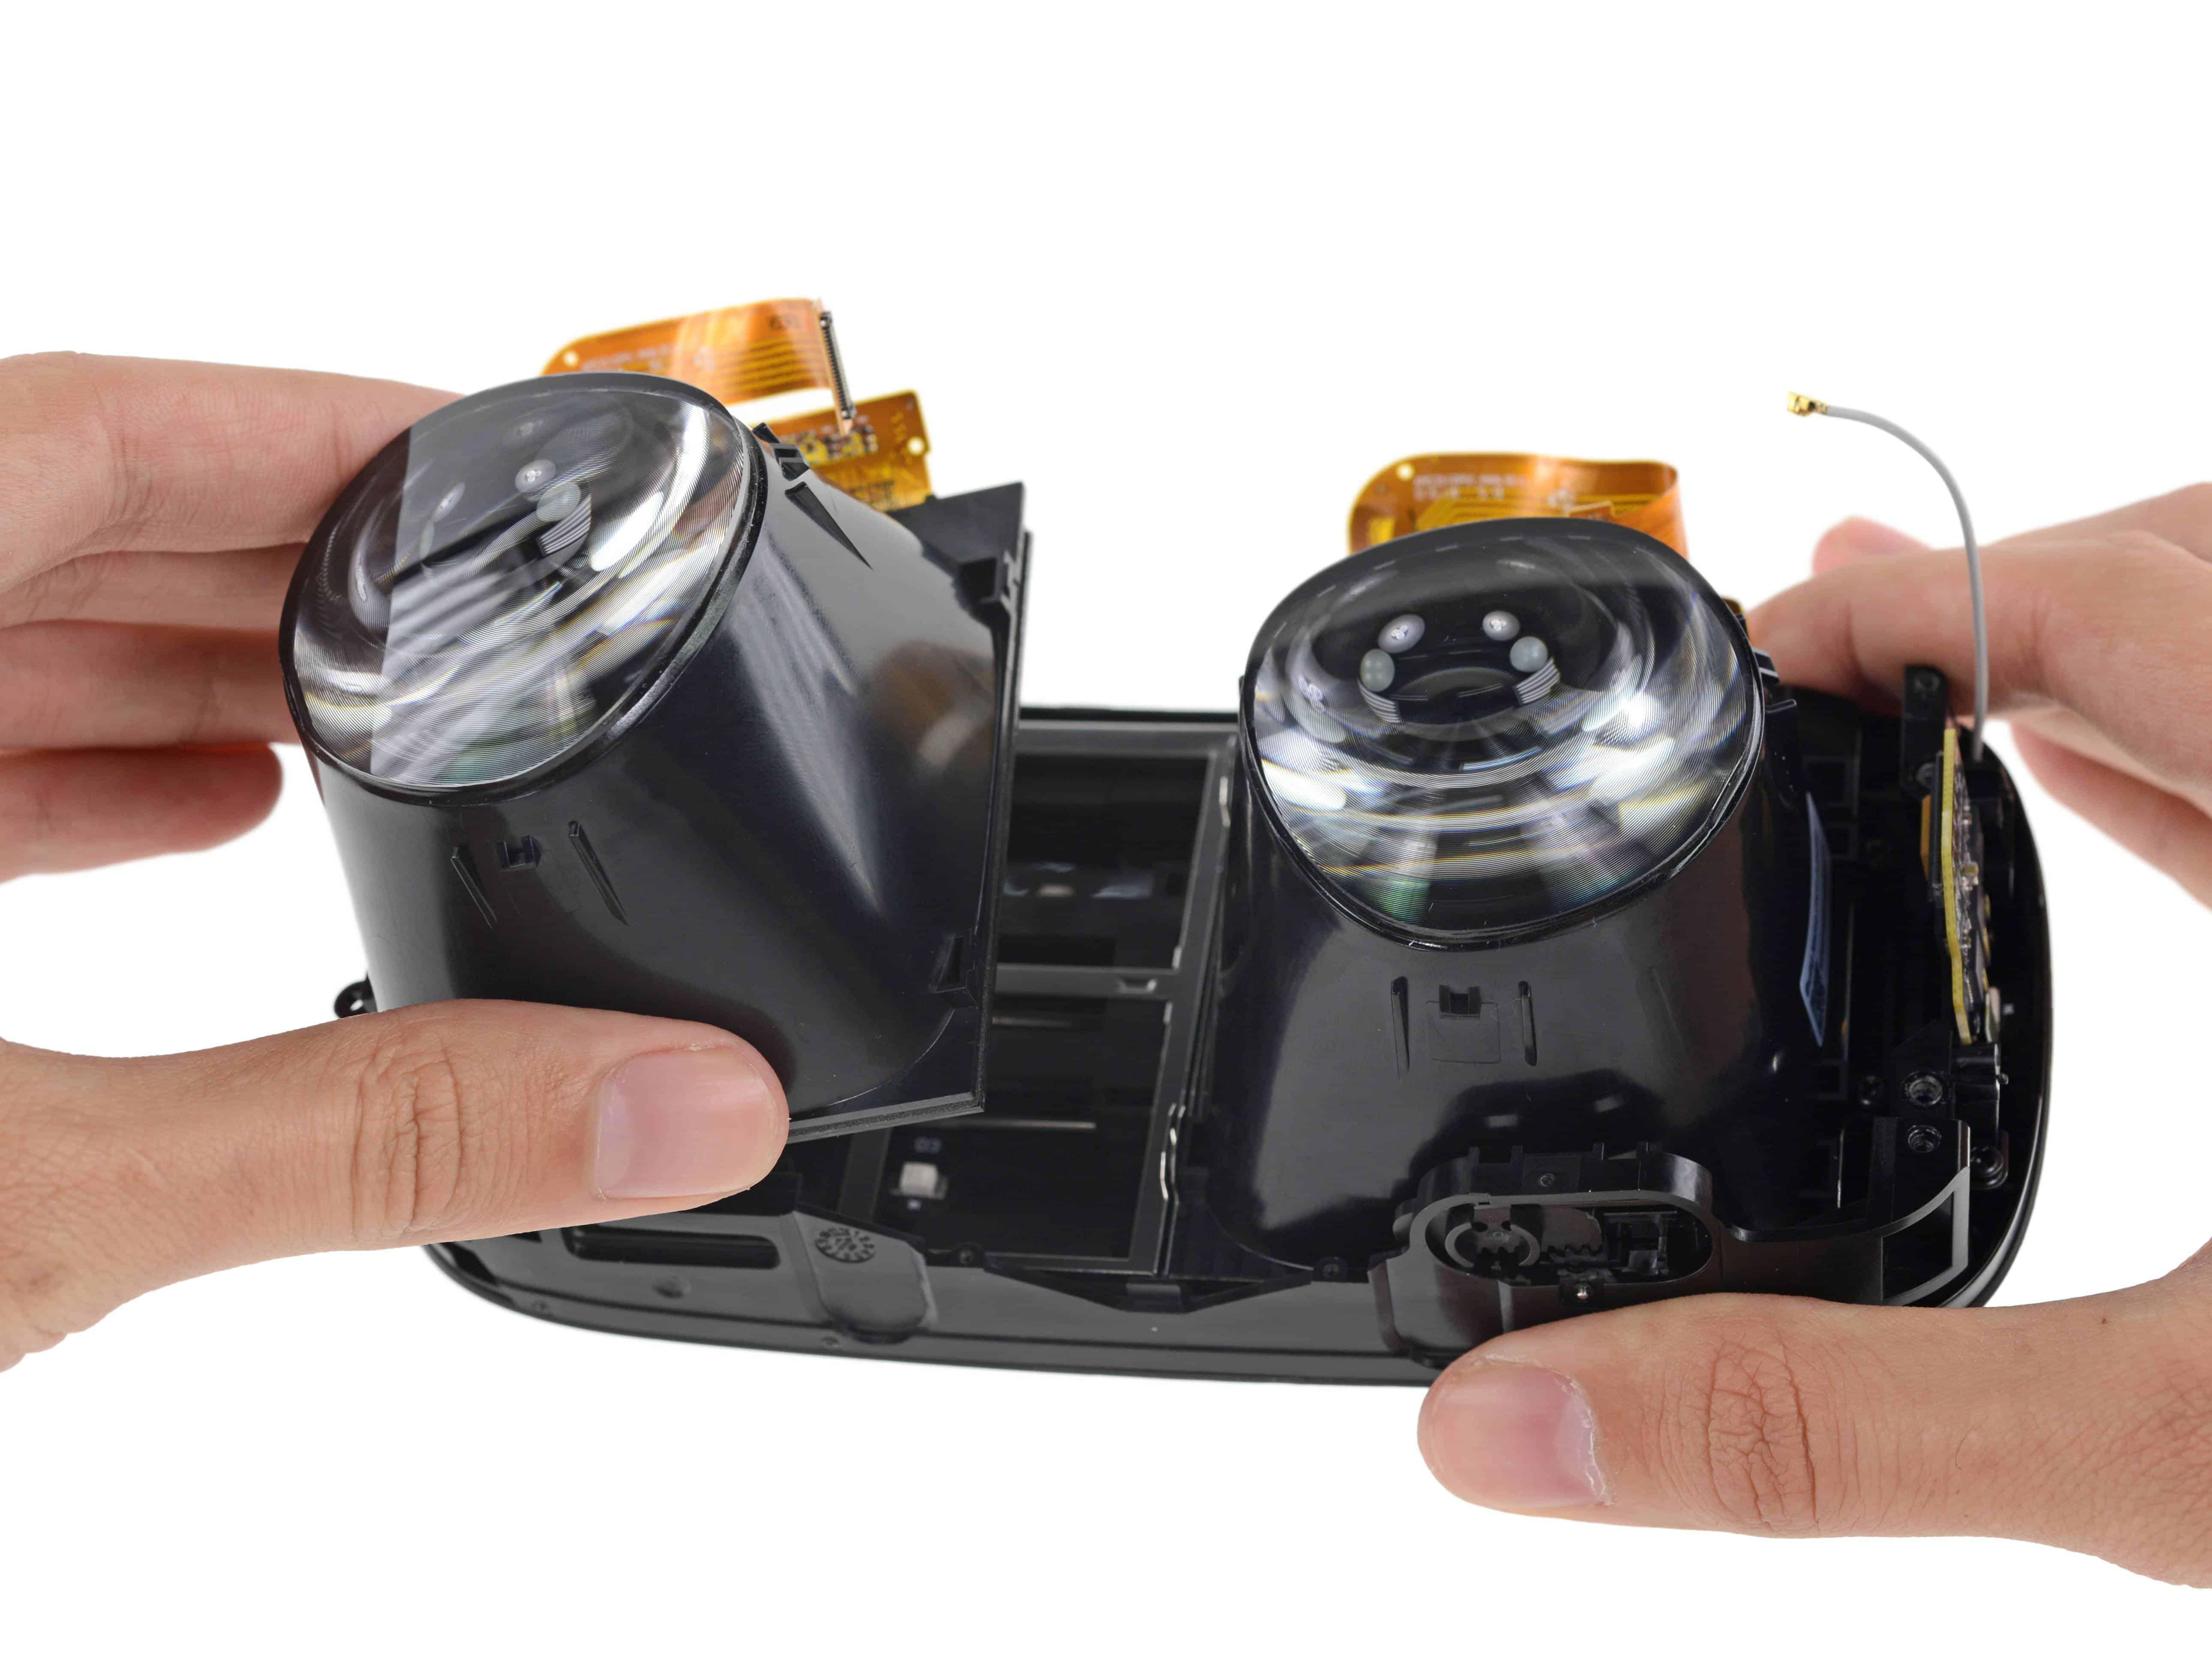 Oculus Rift Teardown 12